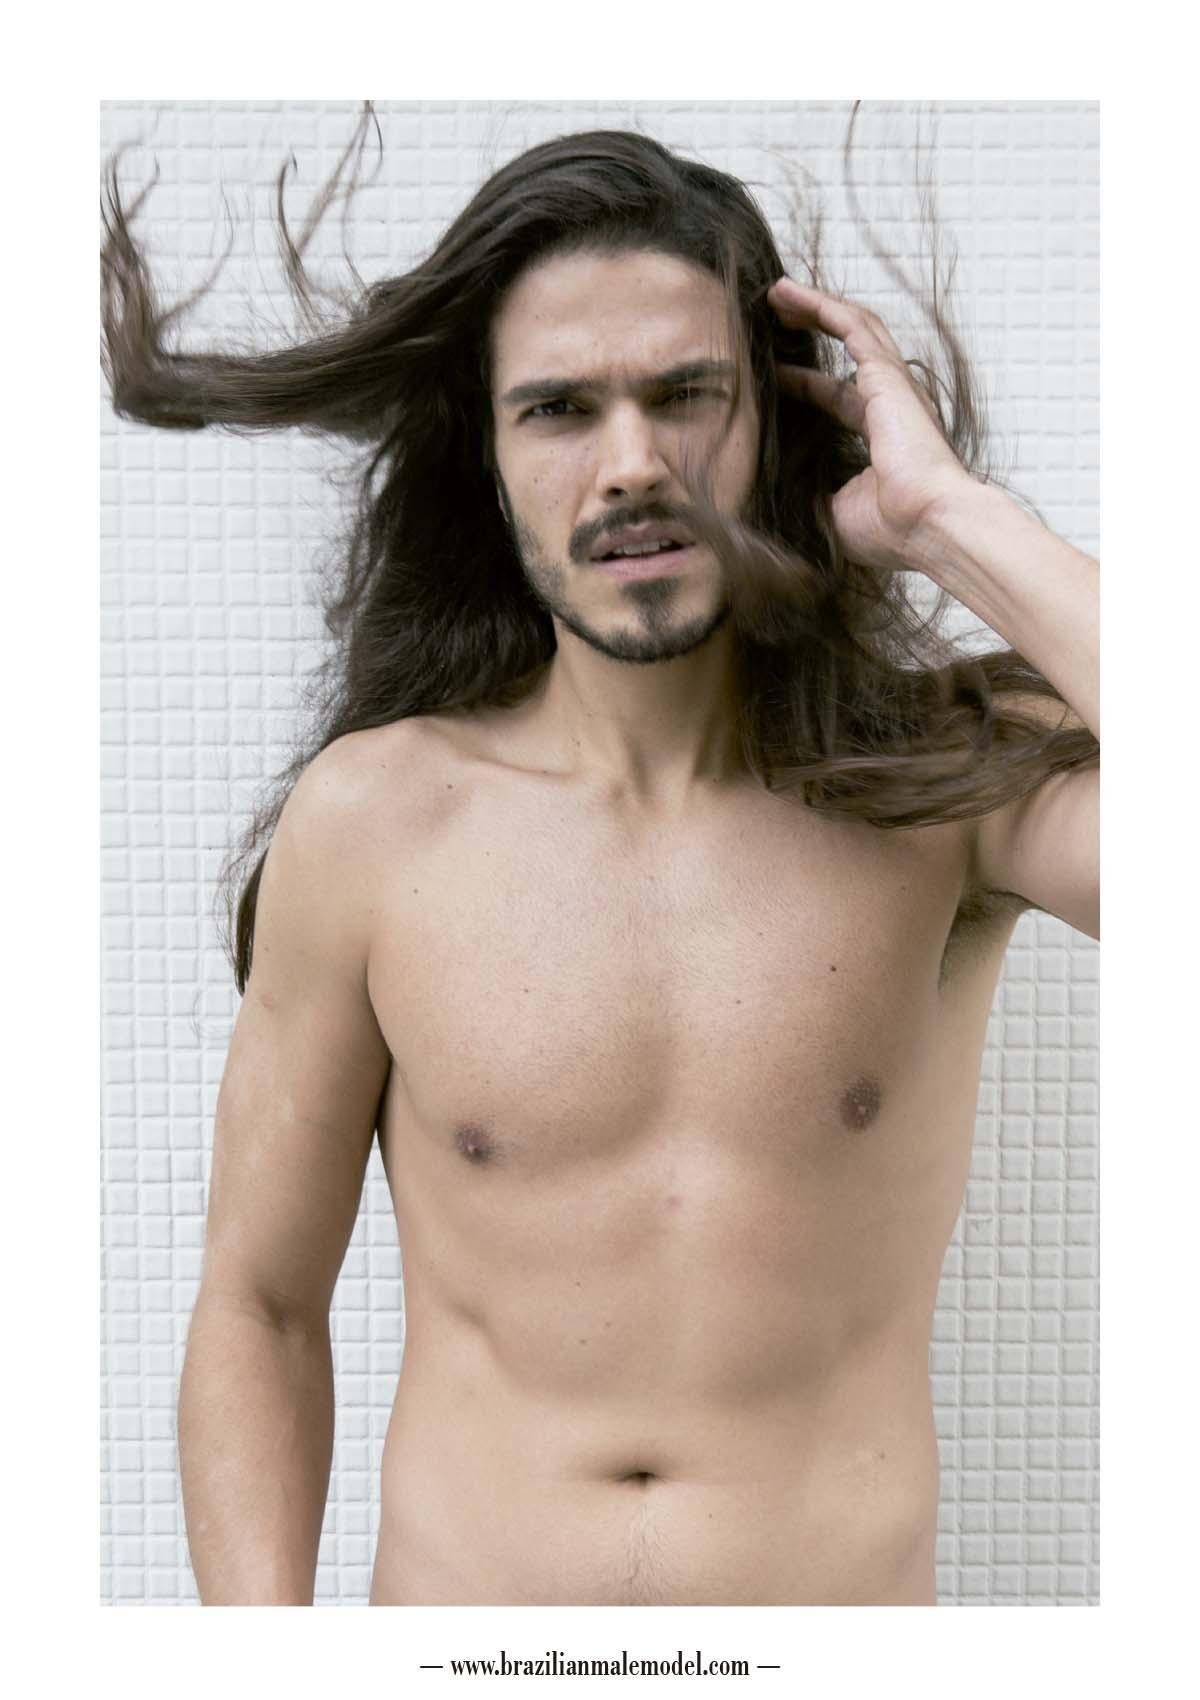 MARCEL FRANCO, MARCELO DELLA MÉA AND PETER HAHMANN BY KENJI NAKAMURA, MAGAZINE #1 Brazilian Male Model